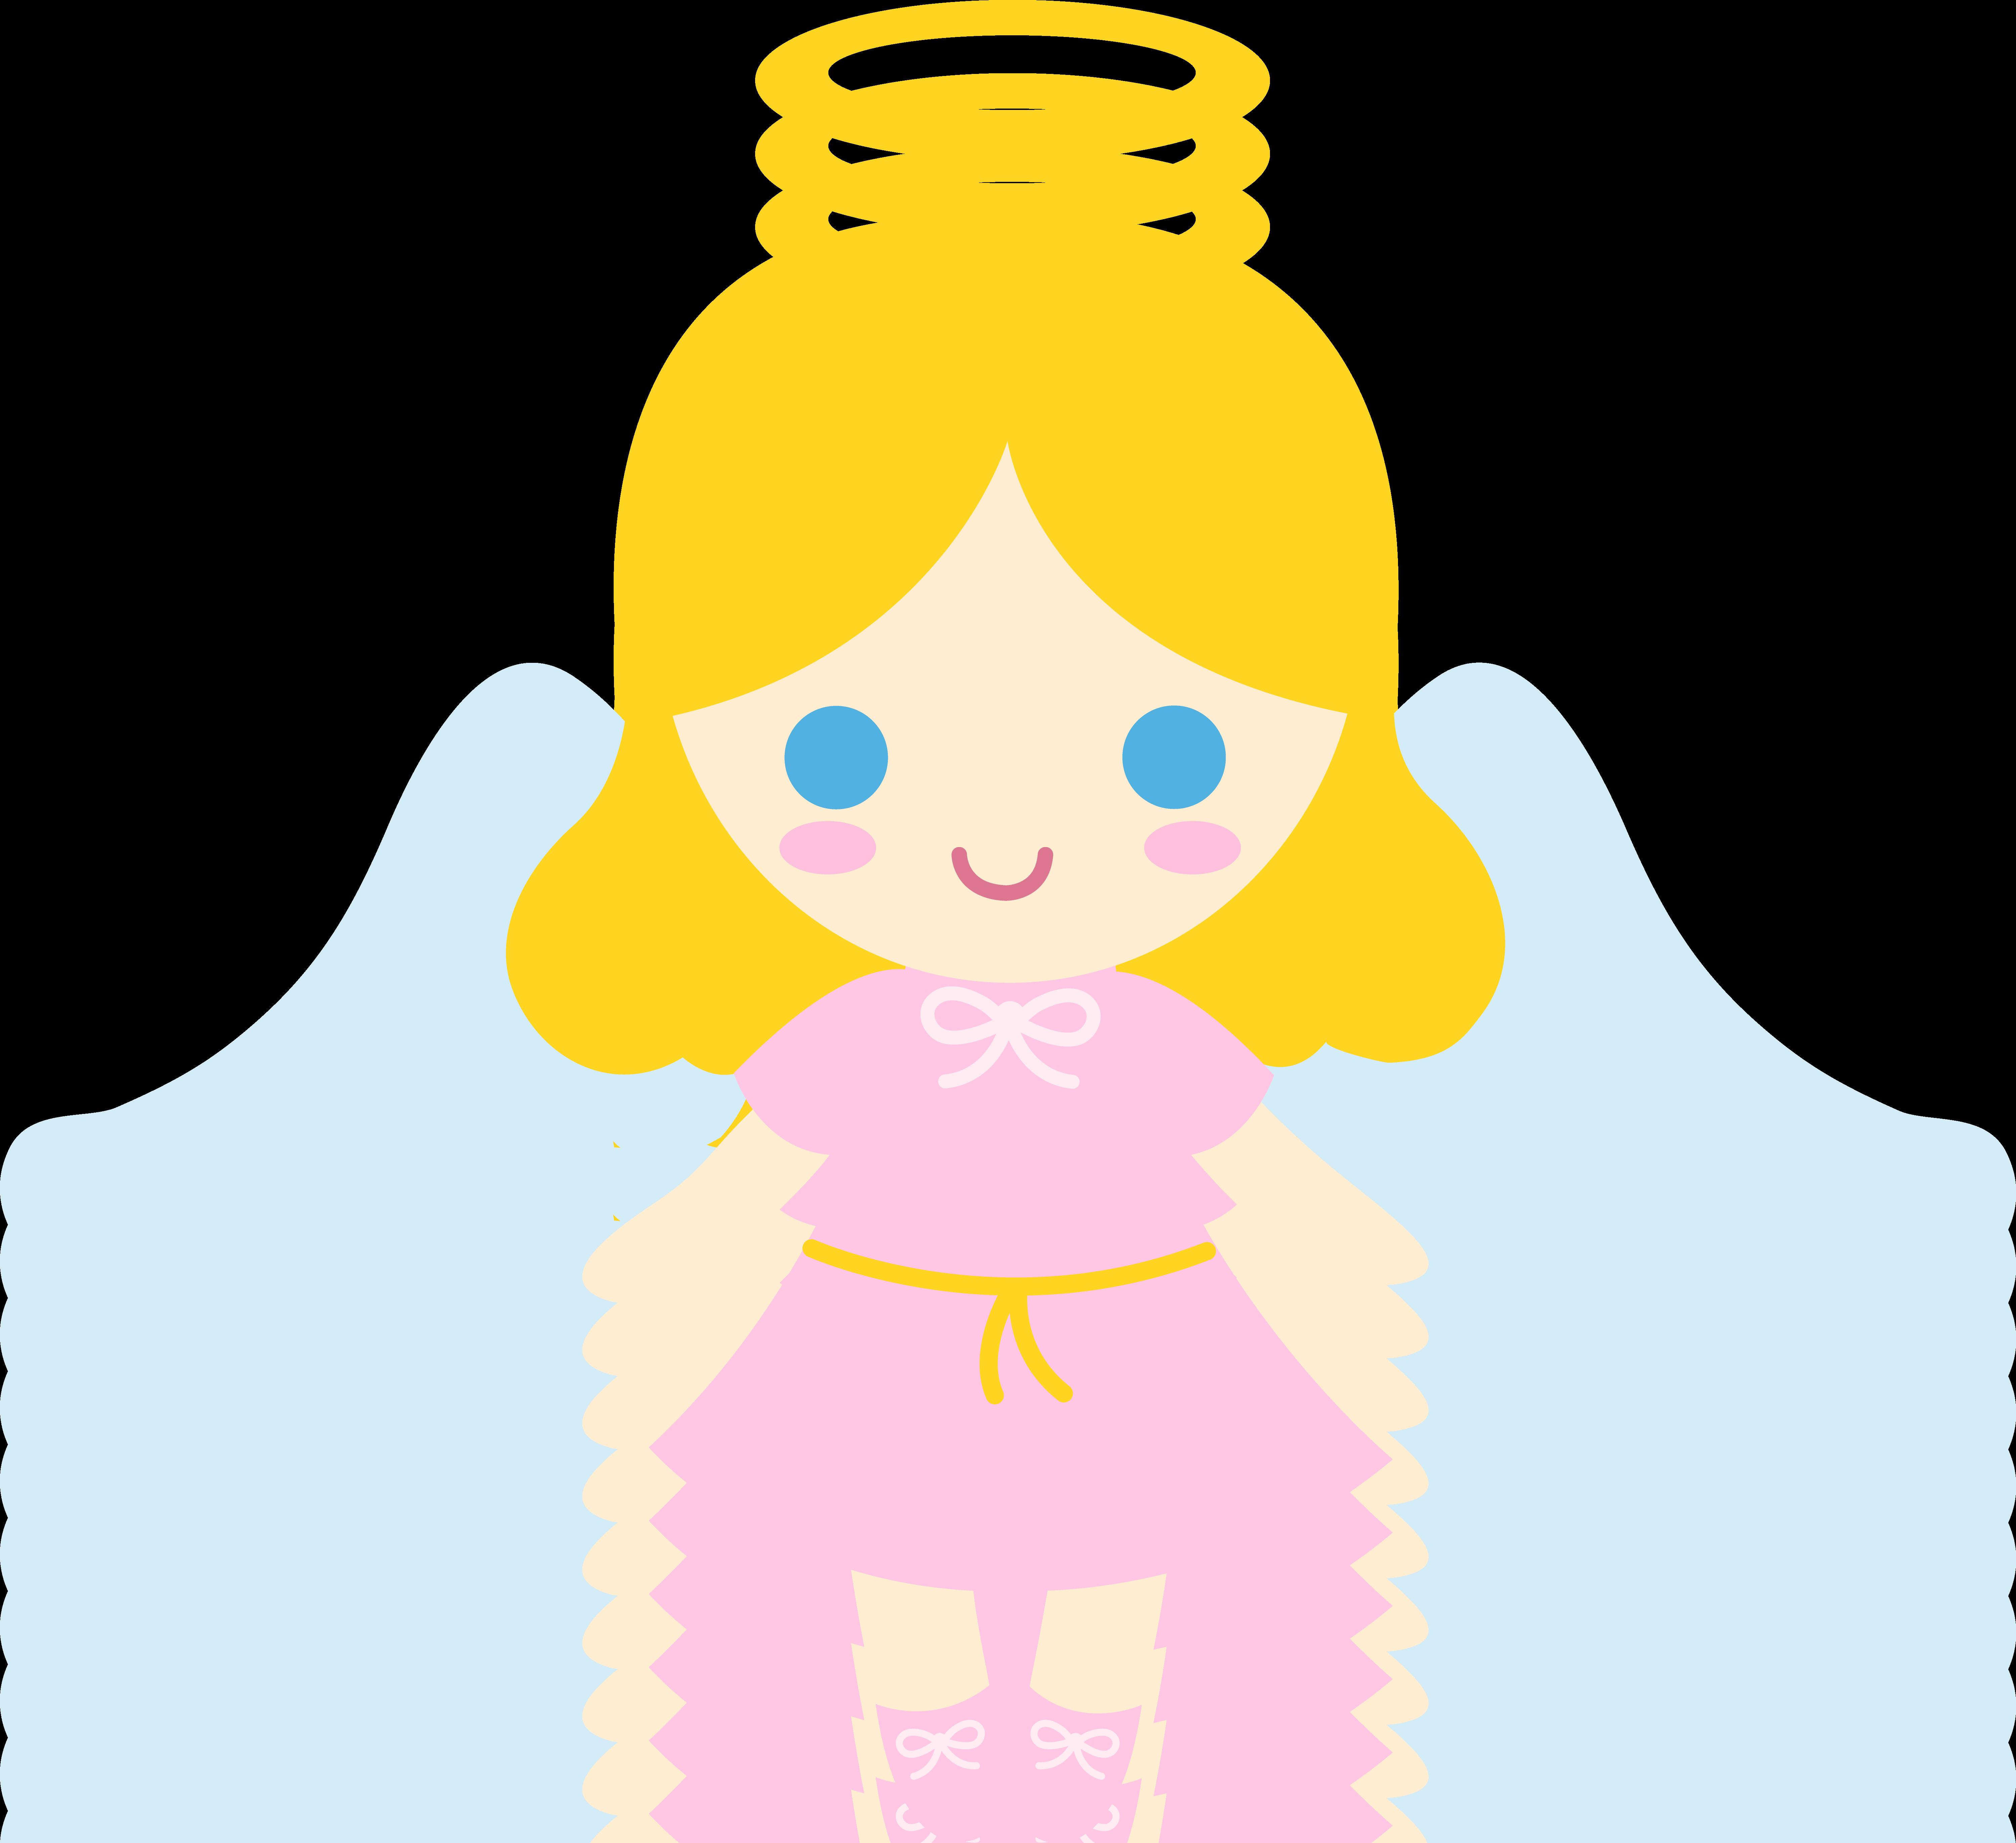 Halo clipart little angel Little Golden Angel Art Angel